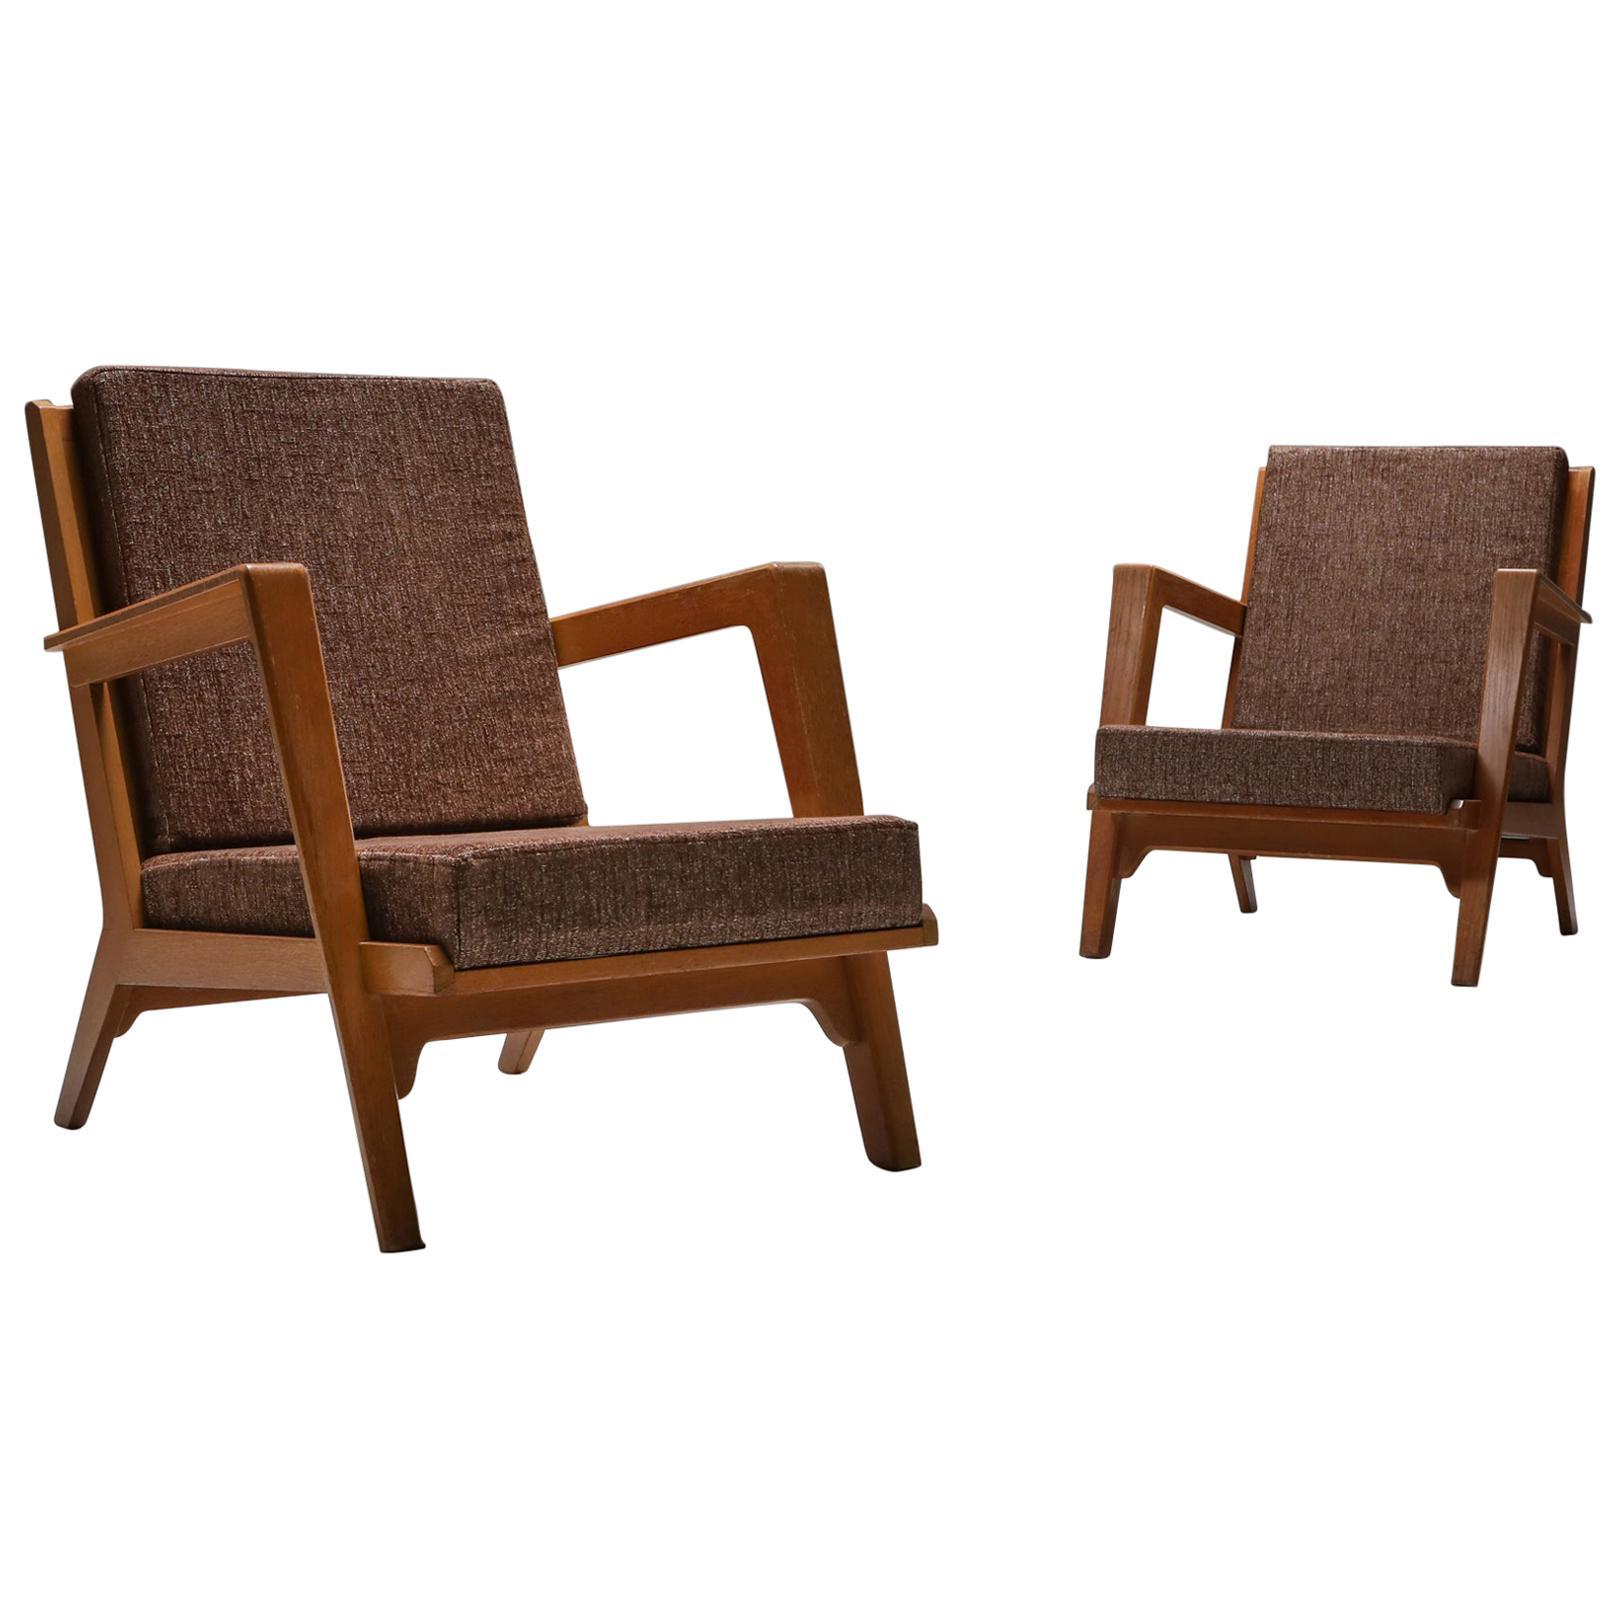 Modernist Easy Chairs by Elmar Berkovich